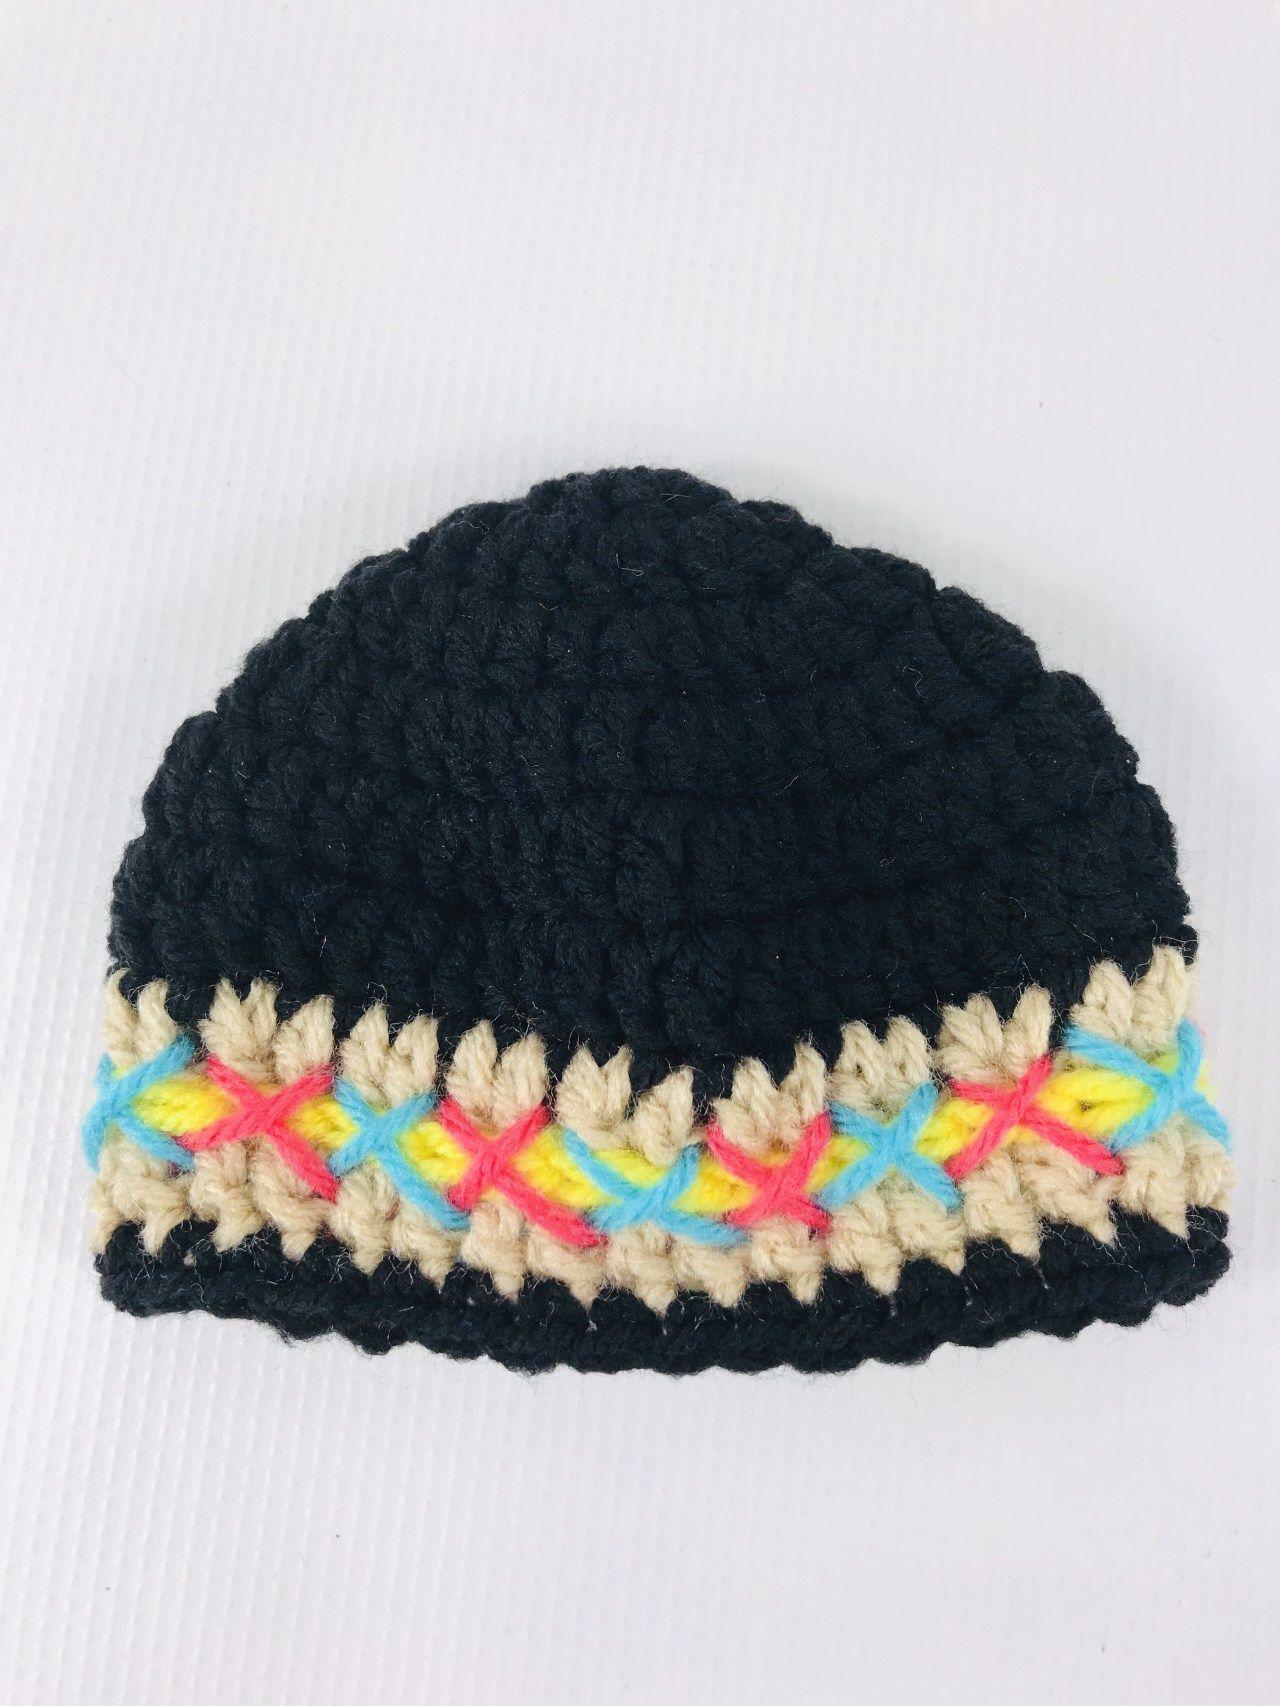 Written Crochet Pattern for Native American 18 Doll Hat #dollhats